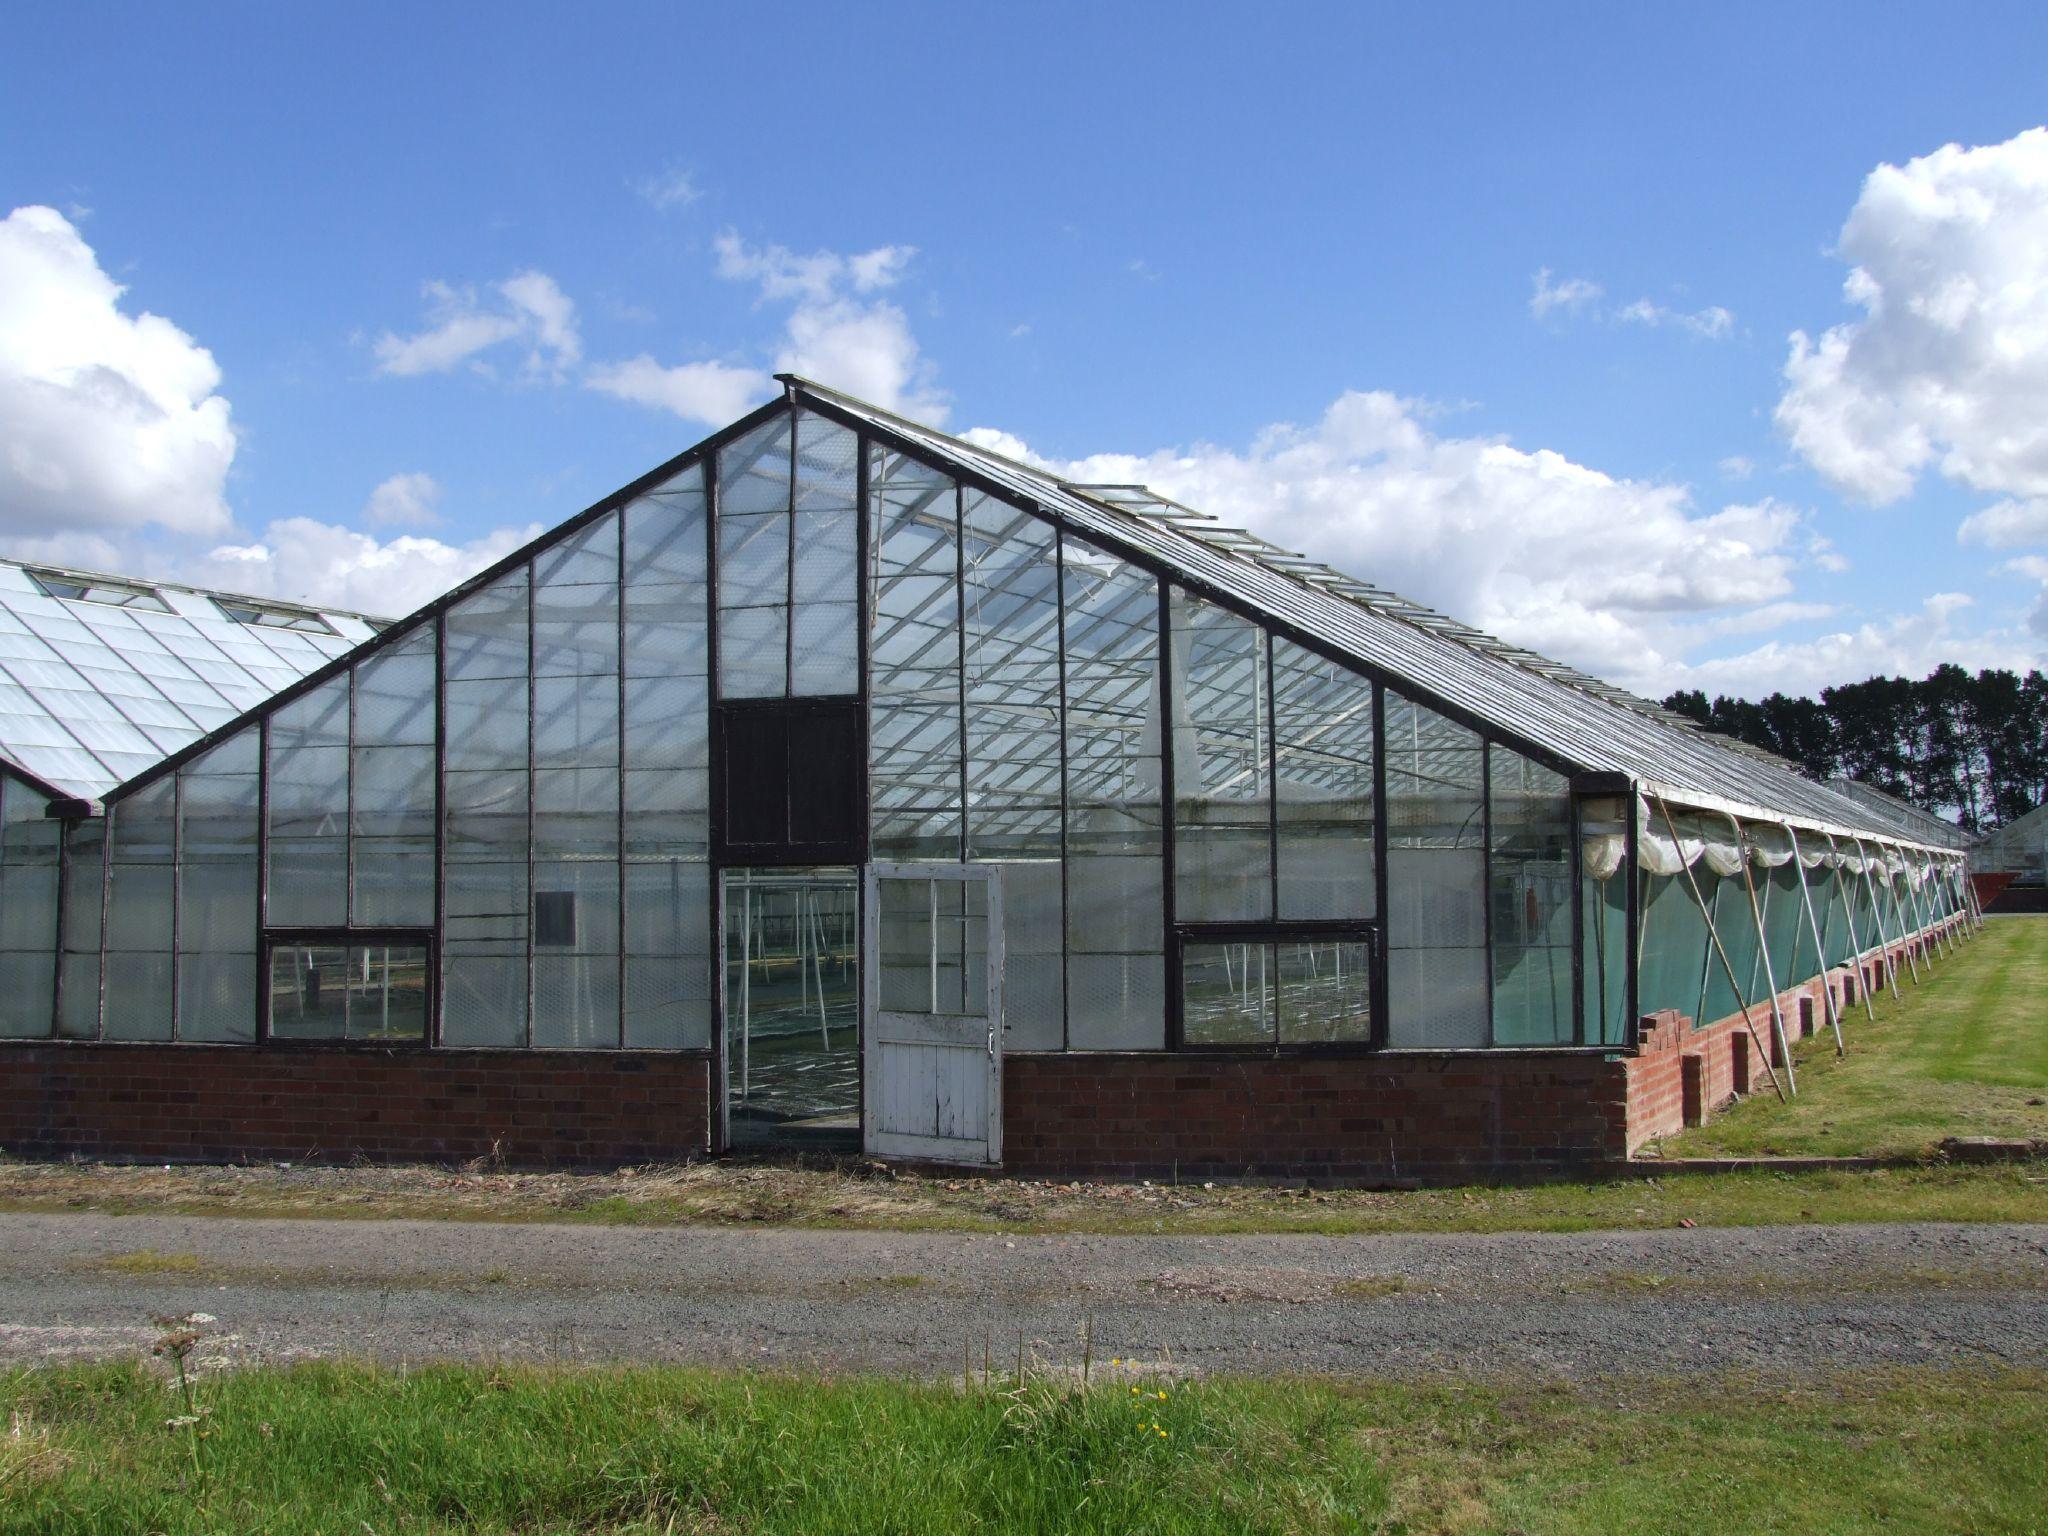 File:Glasshouse crops 1.jpg - Wikimedia ommons - ^